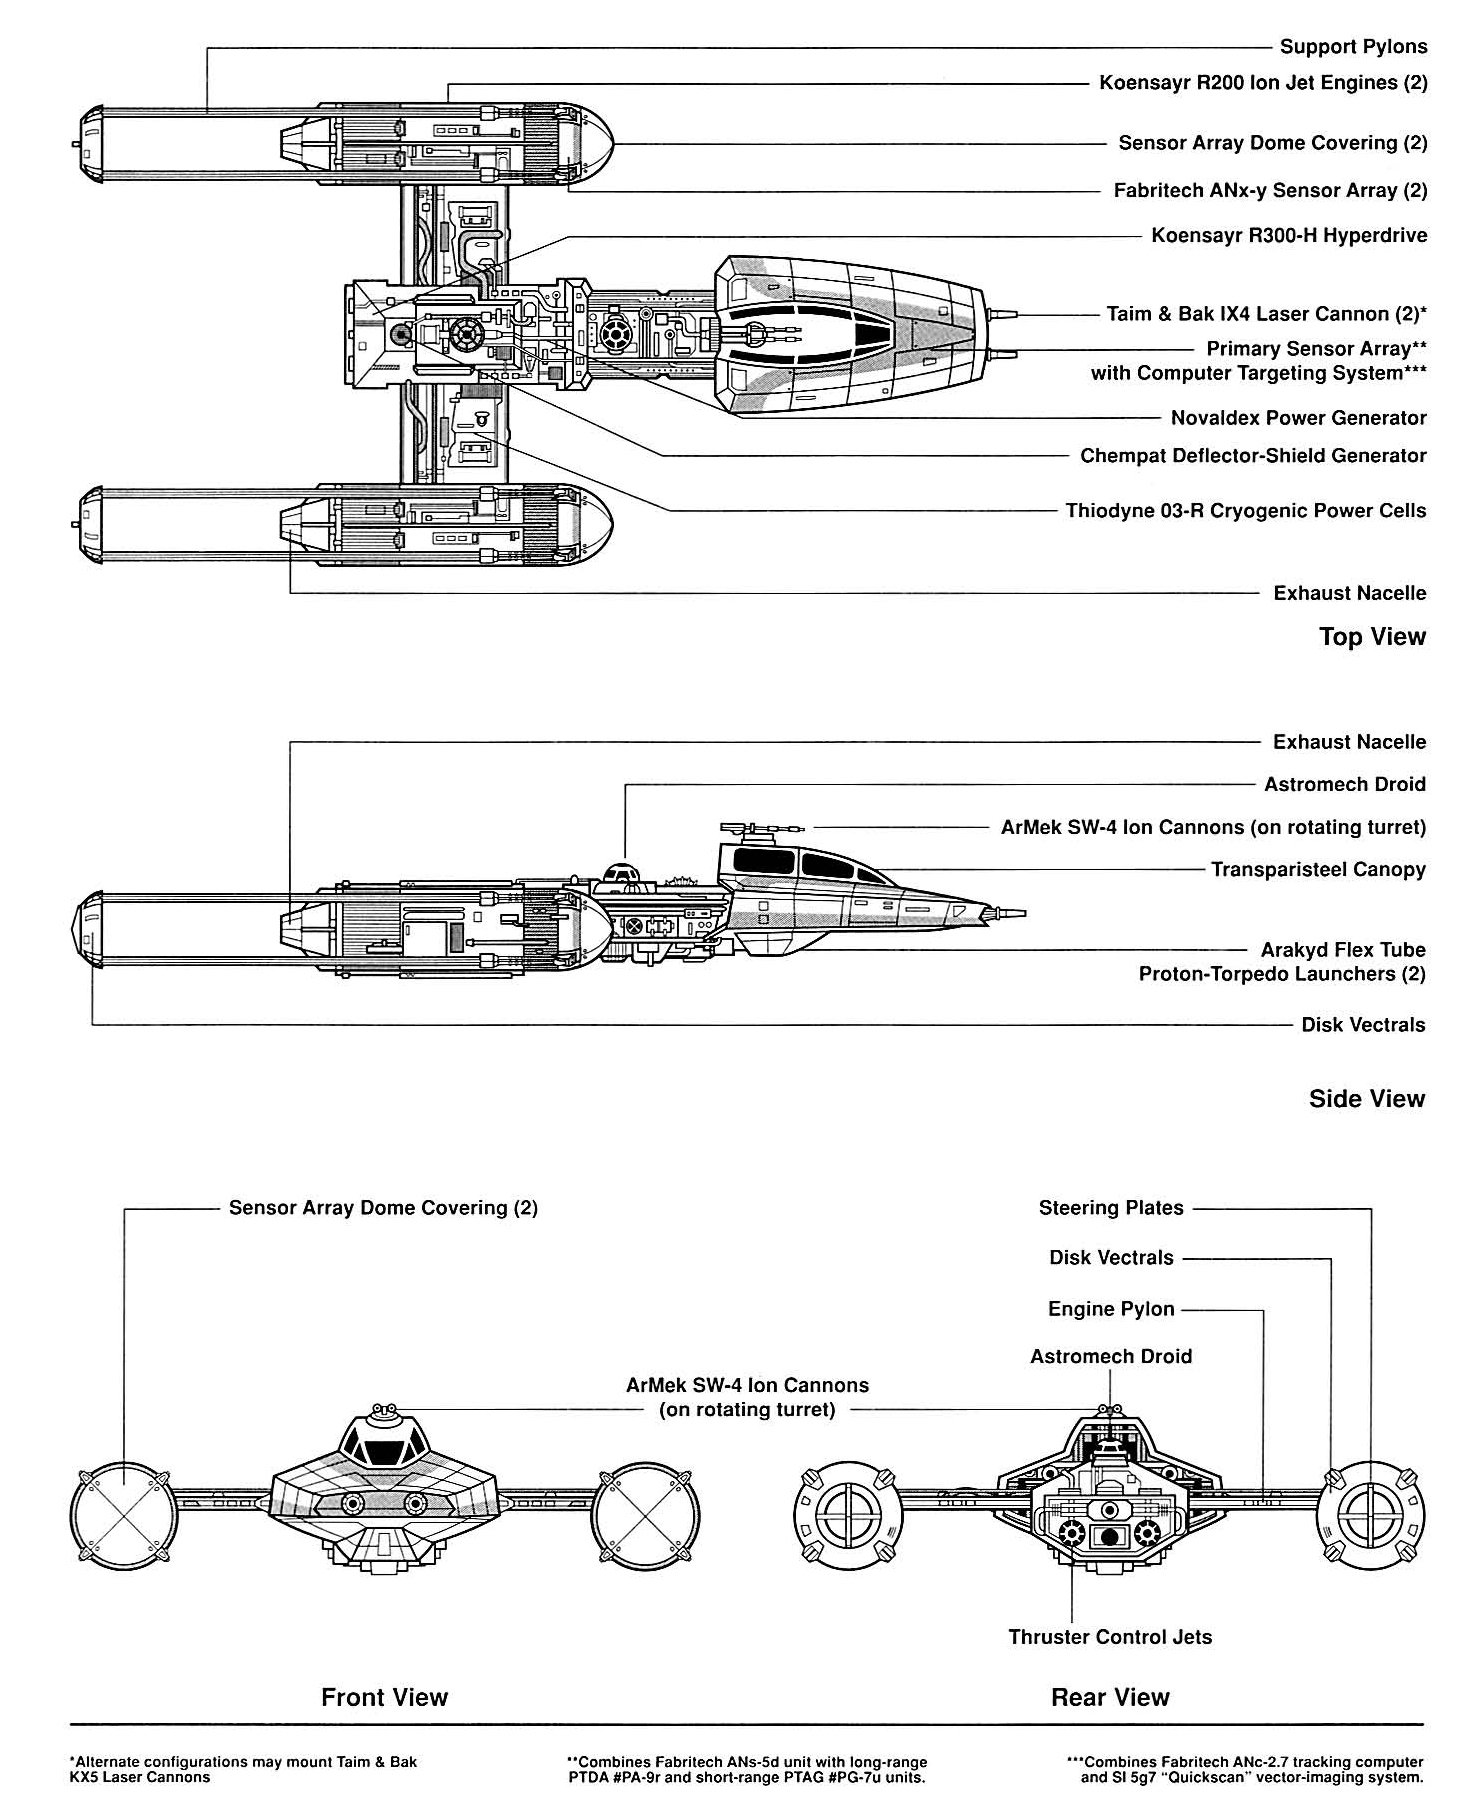 btl ywing starfighter  wookieepedia  fandom powered by wikia, schematic